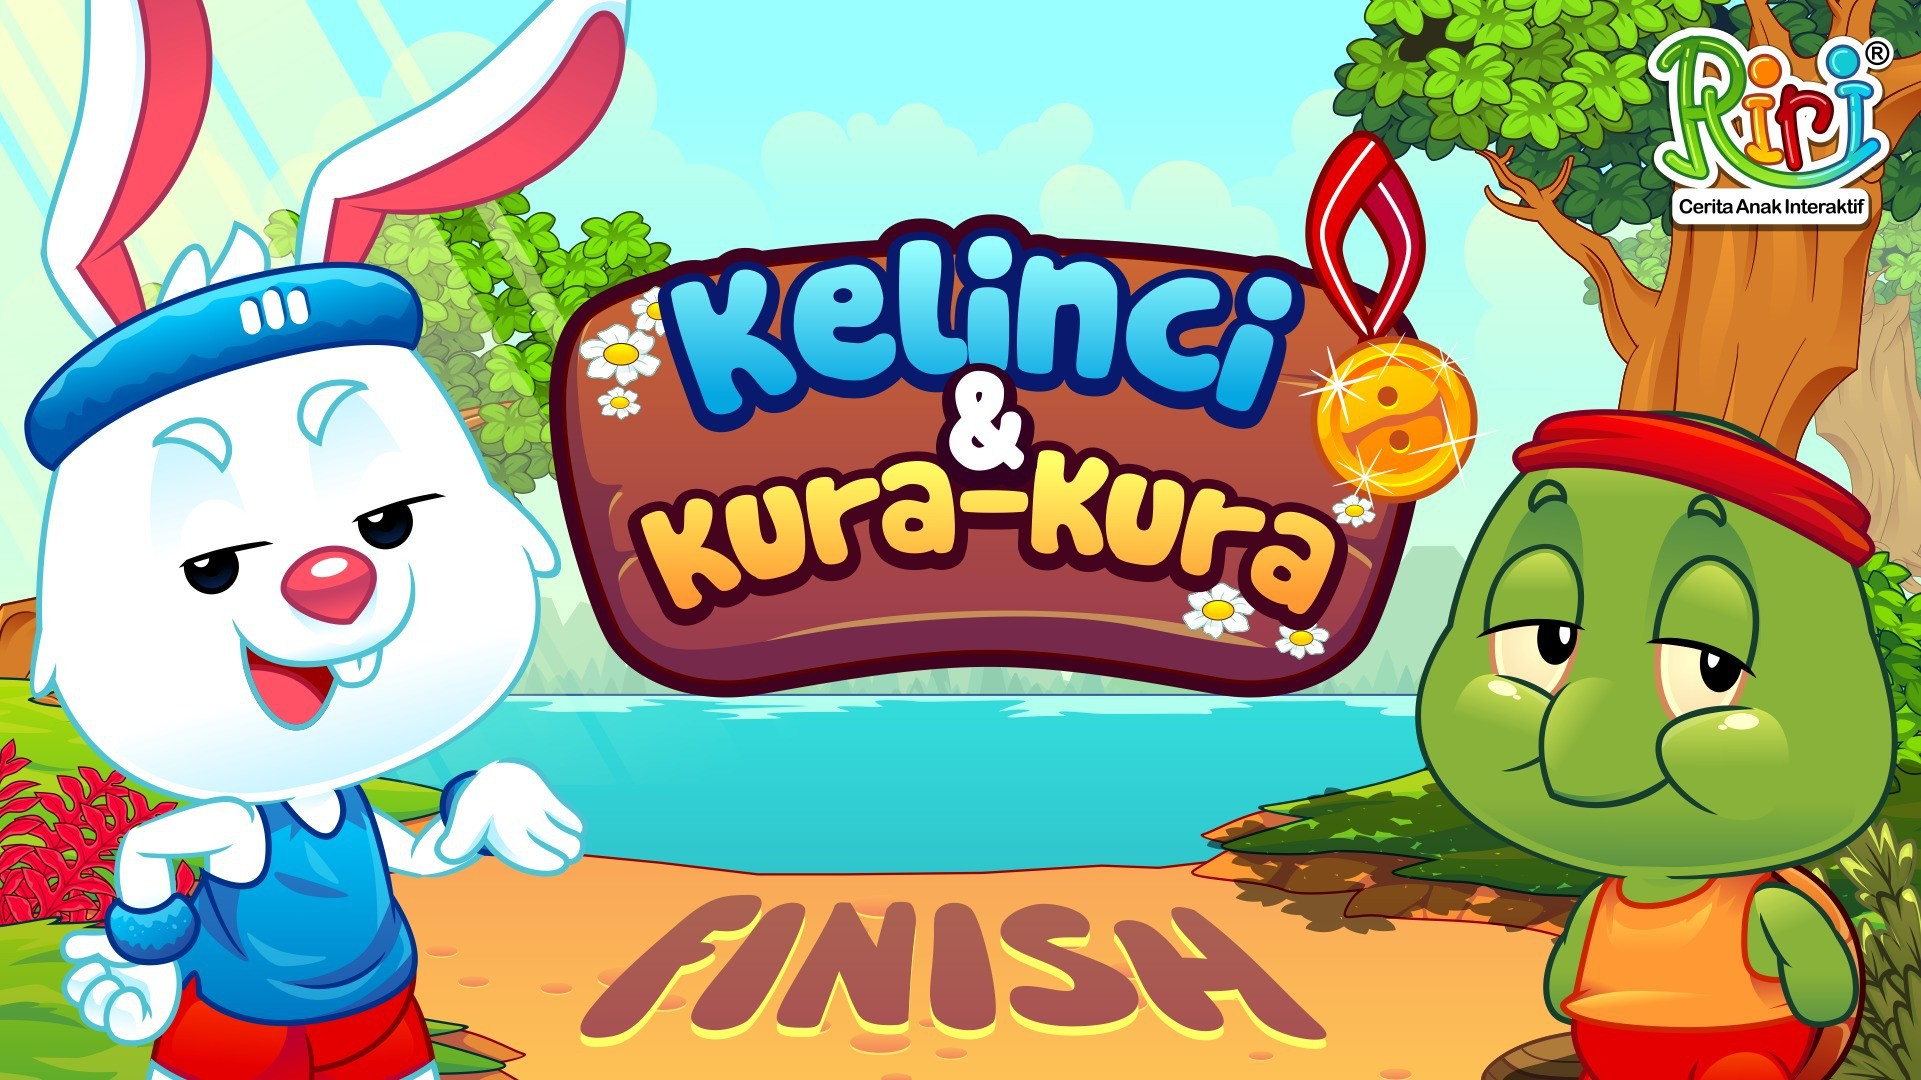 Streaming Riri Cerita Rakyat Kelinci Dan Kura Kura Dongeng Anak Bahasa Indonesia Sebelum Tidur Fabel Aesop Hare And Tortoise Vidio Com